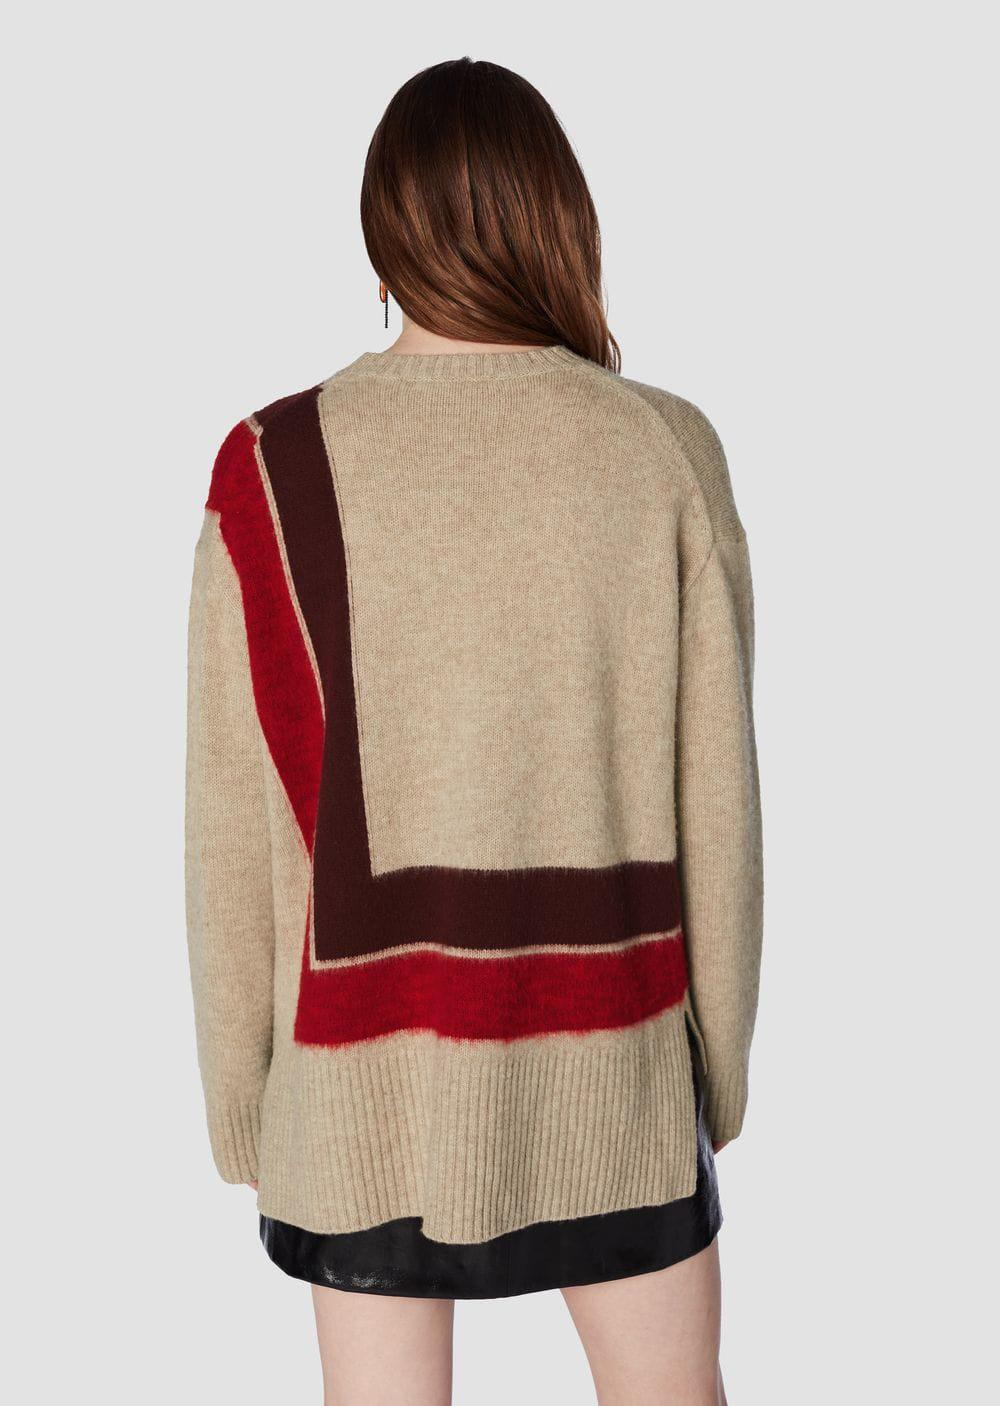 fa06866190 Lyst - 10 Crosby Derek Lam Crewneck Blanket Sweater in Red